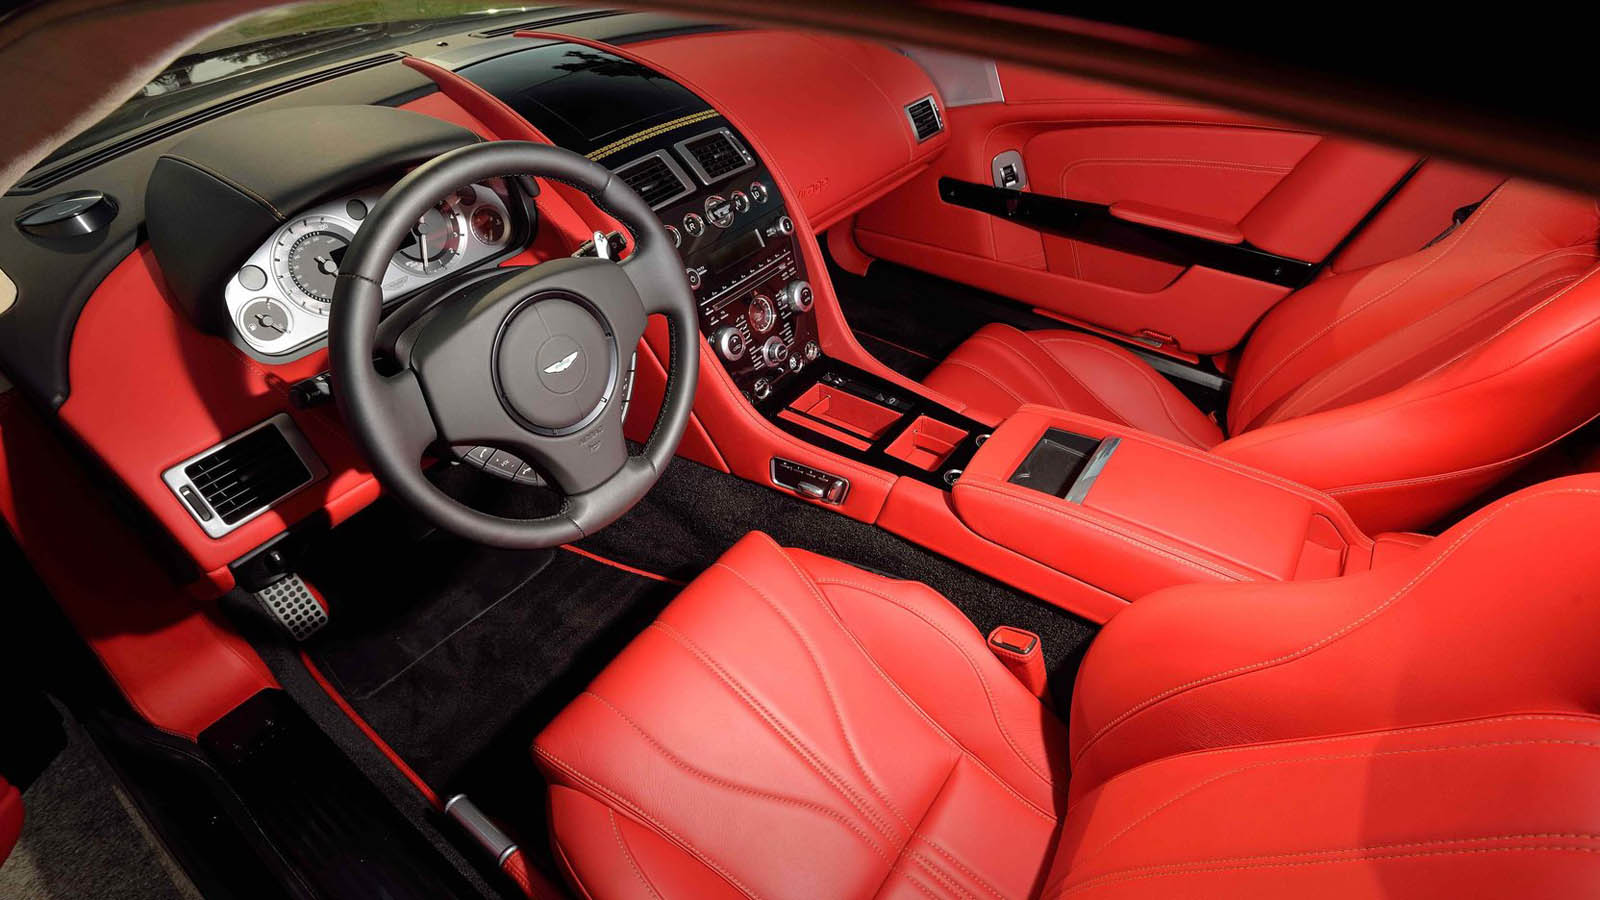 Aston_Martin_Virage_Dragon_88_Edition_10